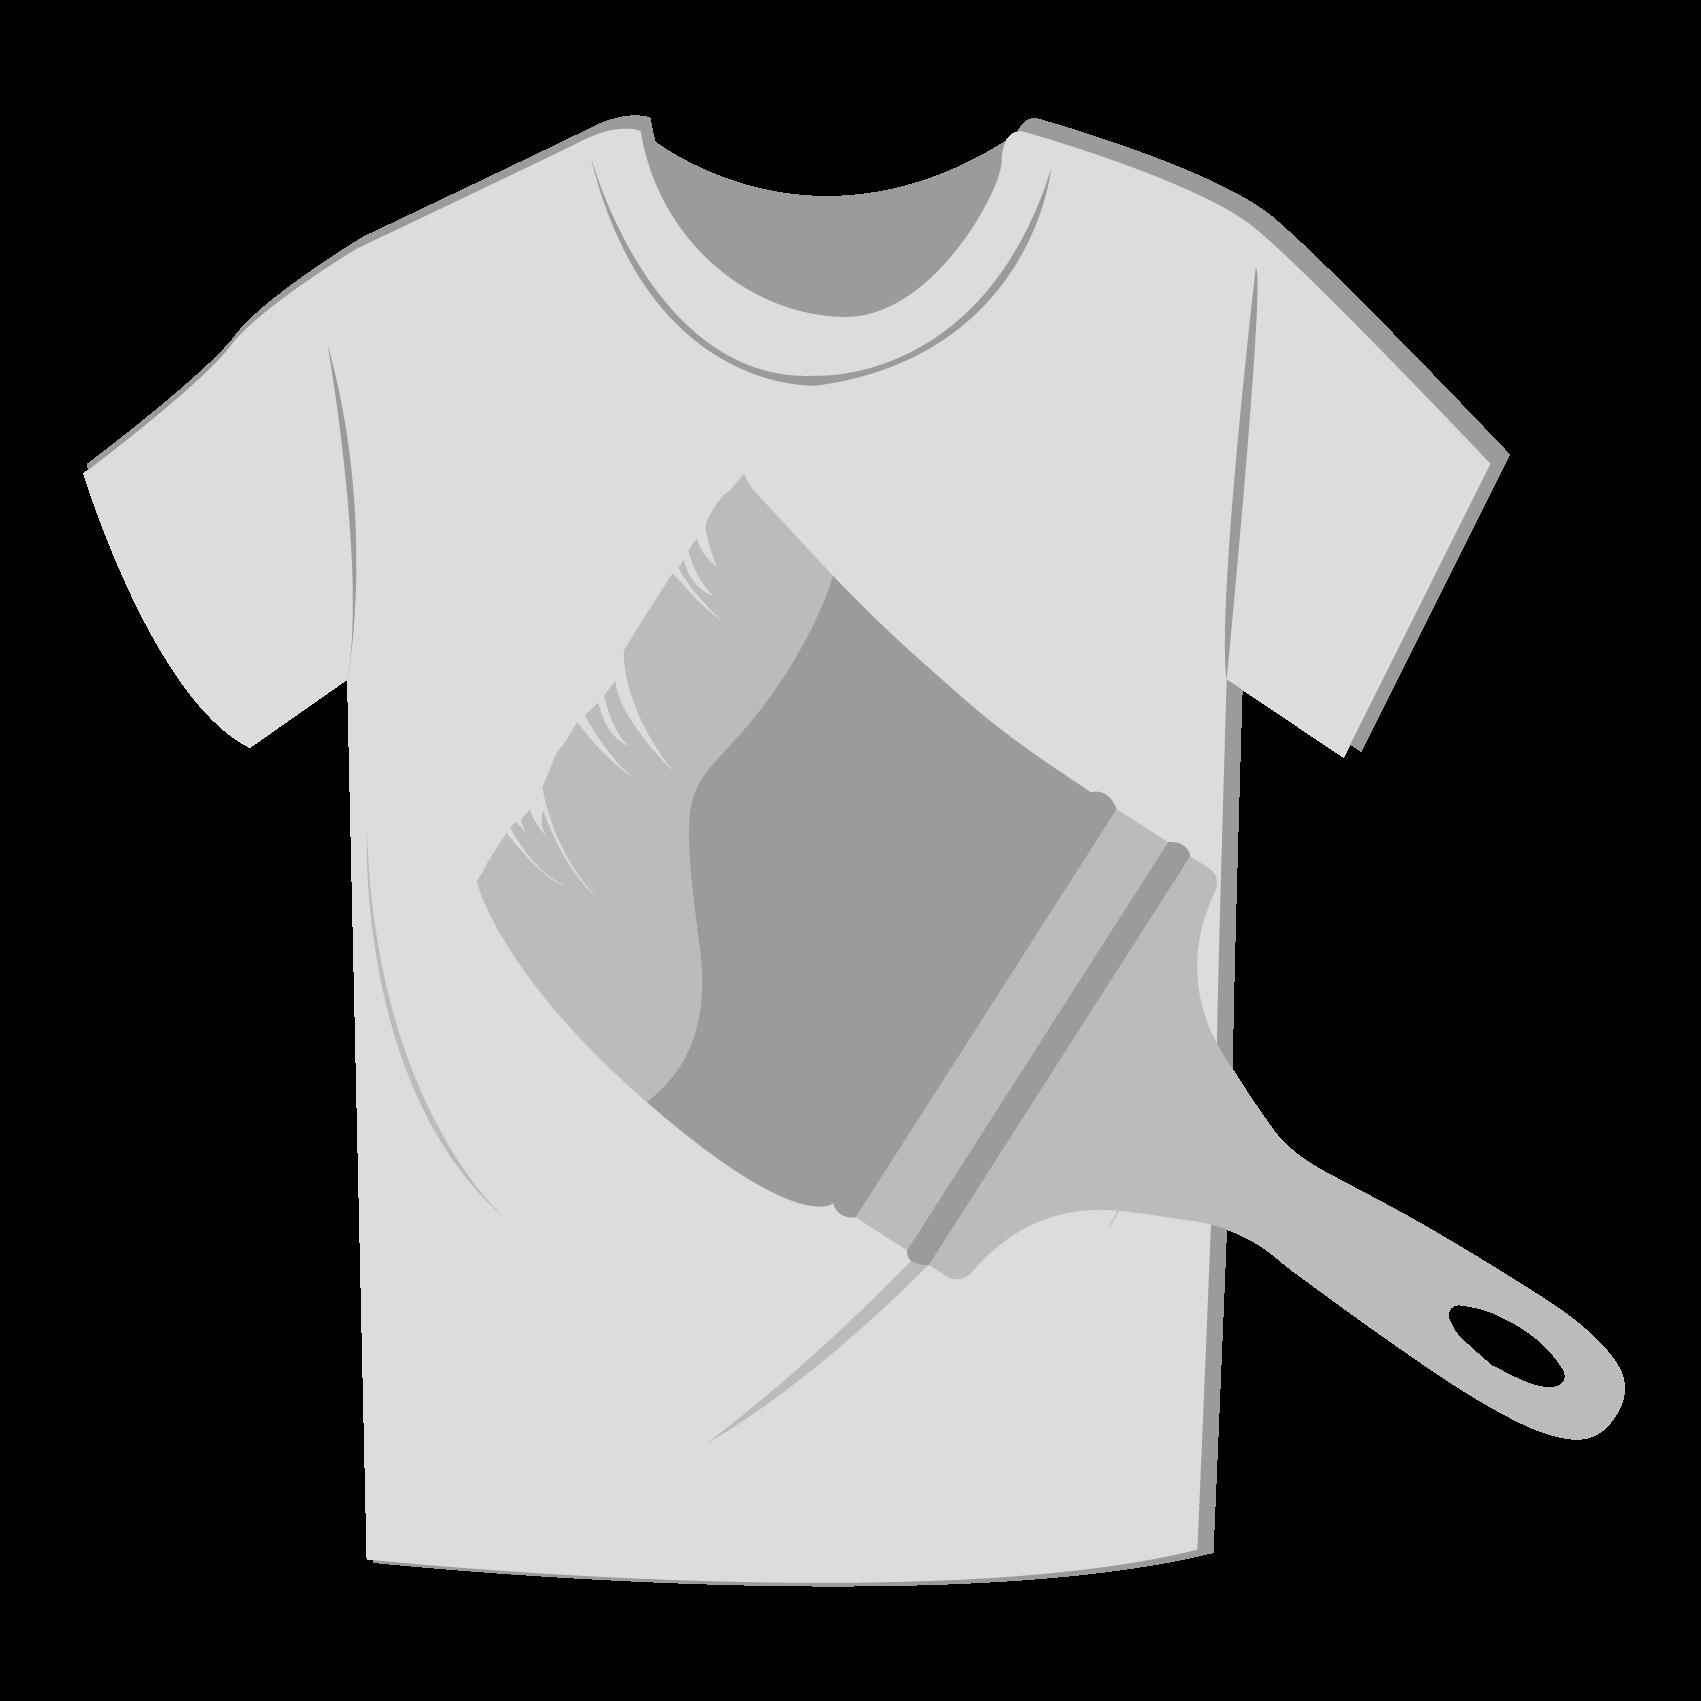 Signaal Bedrijfskleding - Custom ontwerp